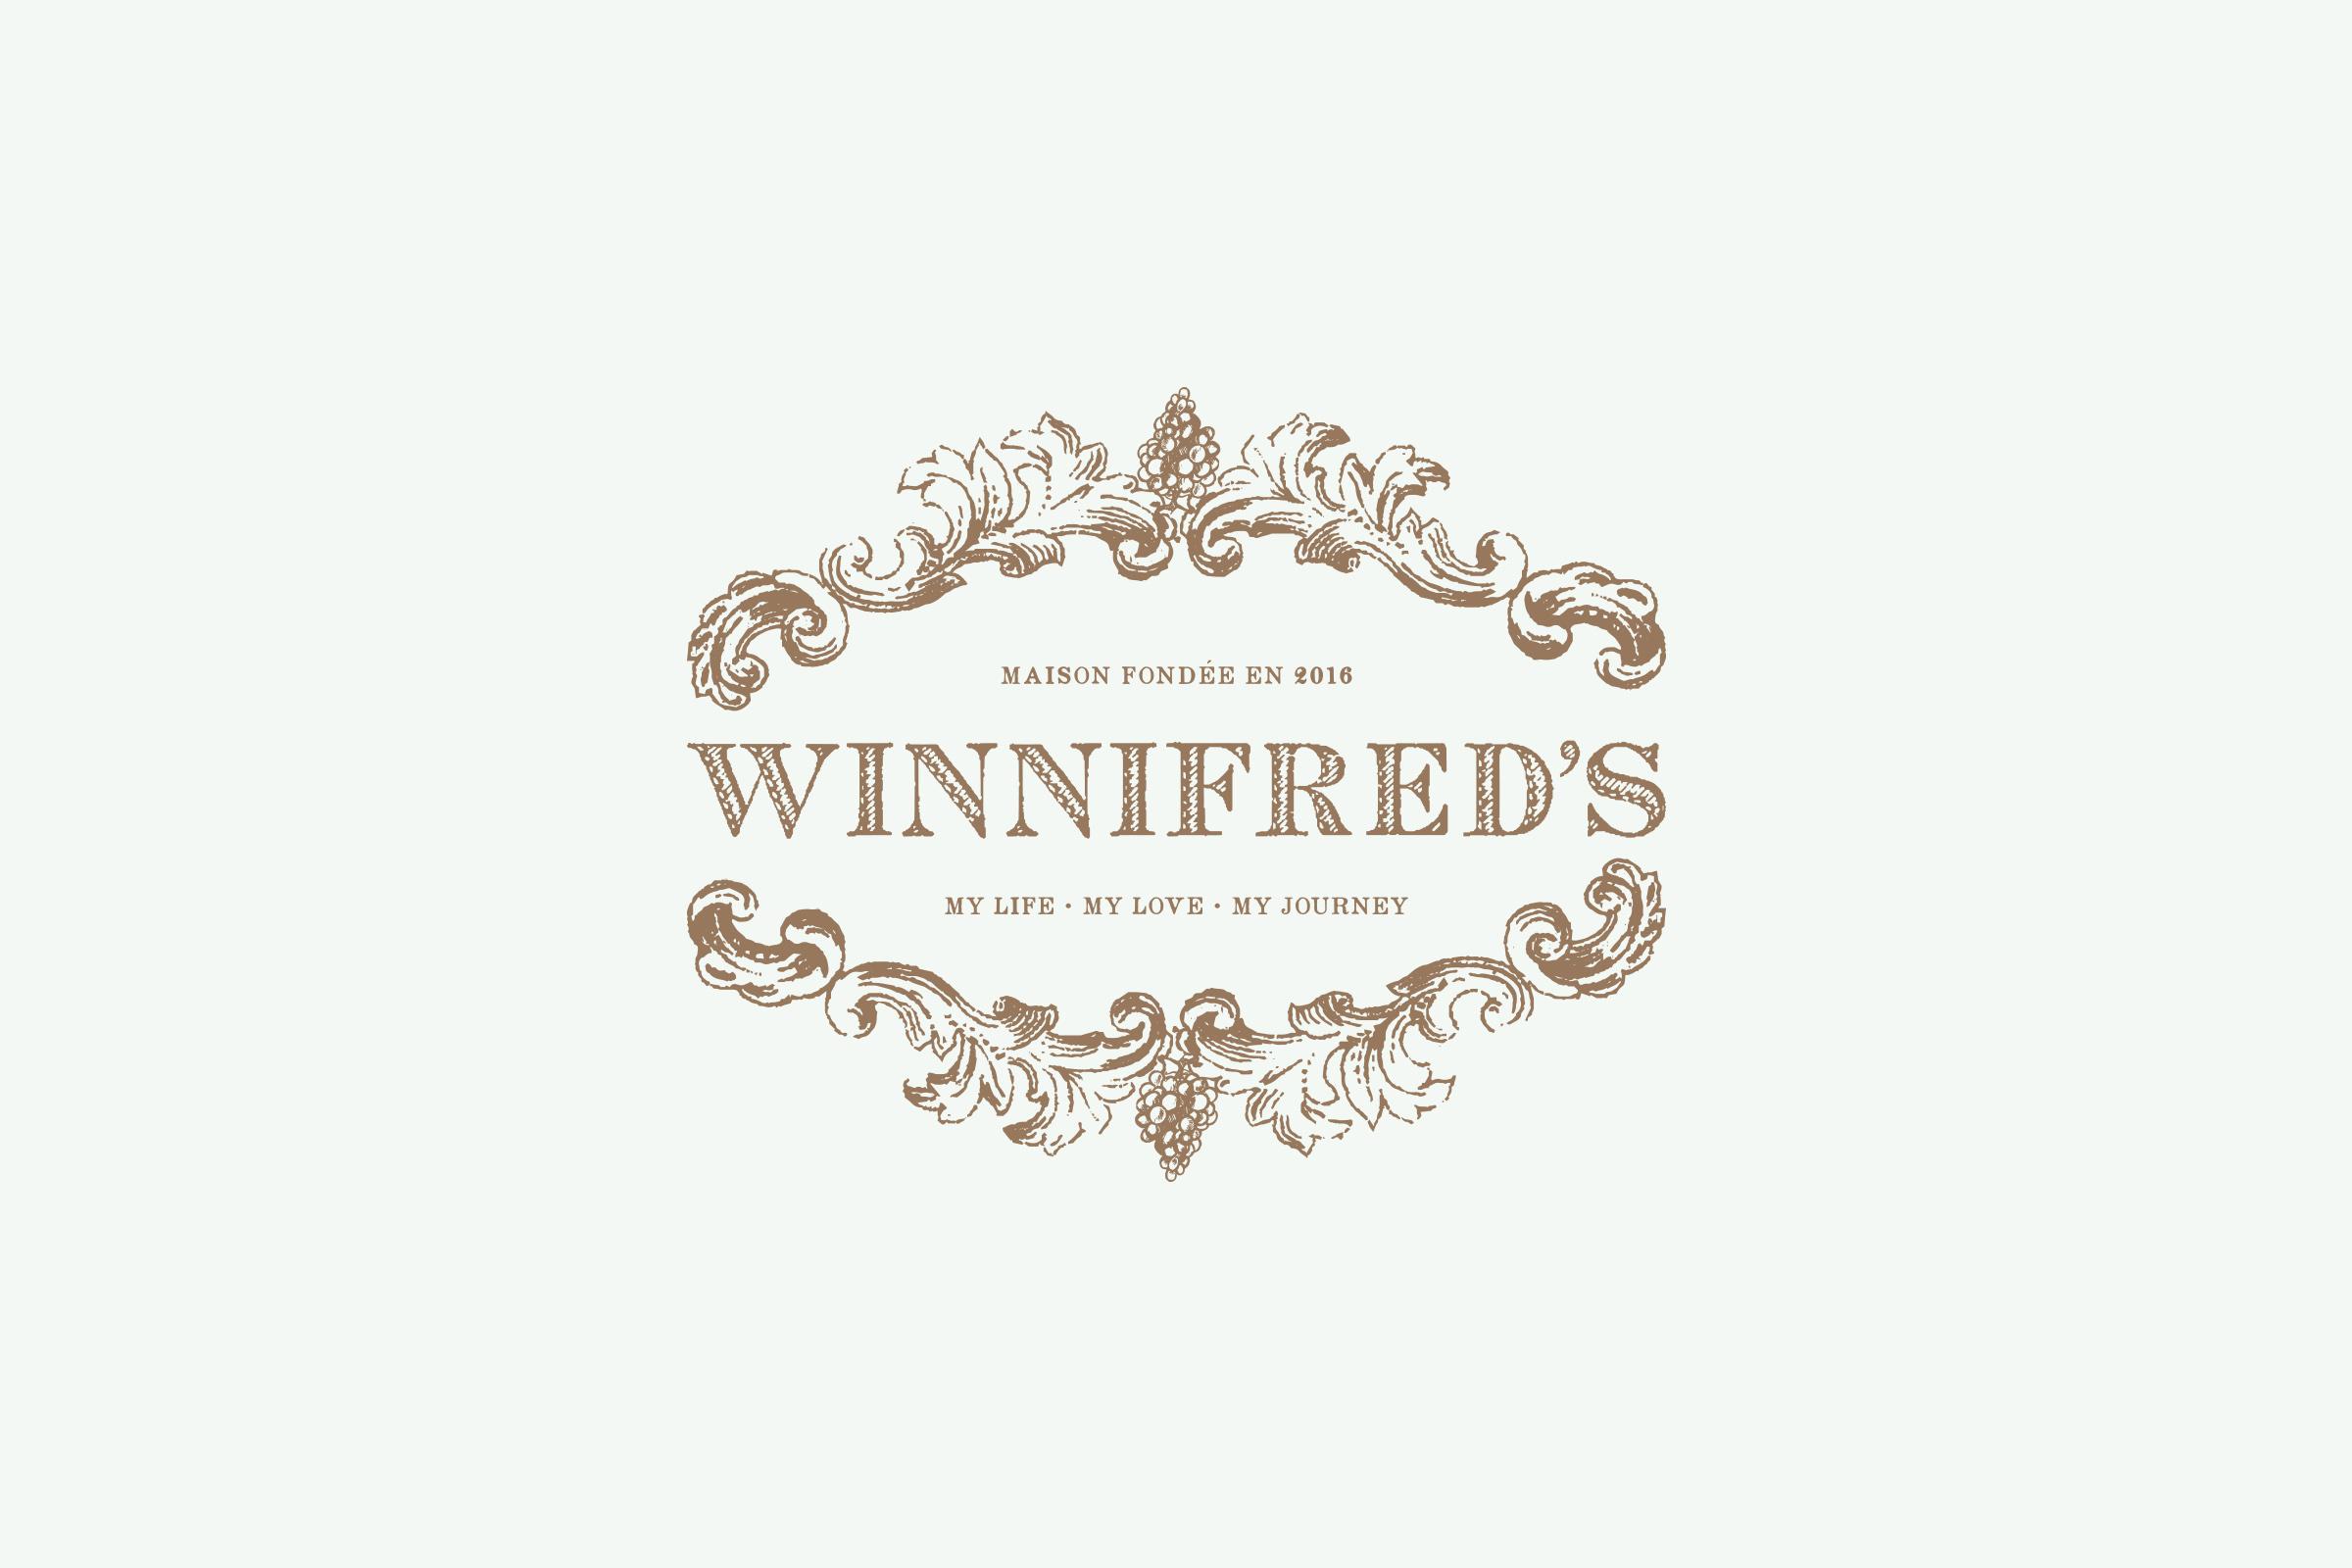 00_Winnifred's_Champagne_Logo_by_Foster.jpg